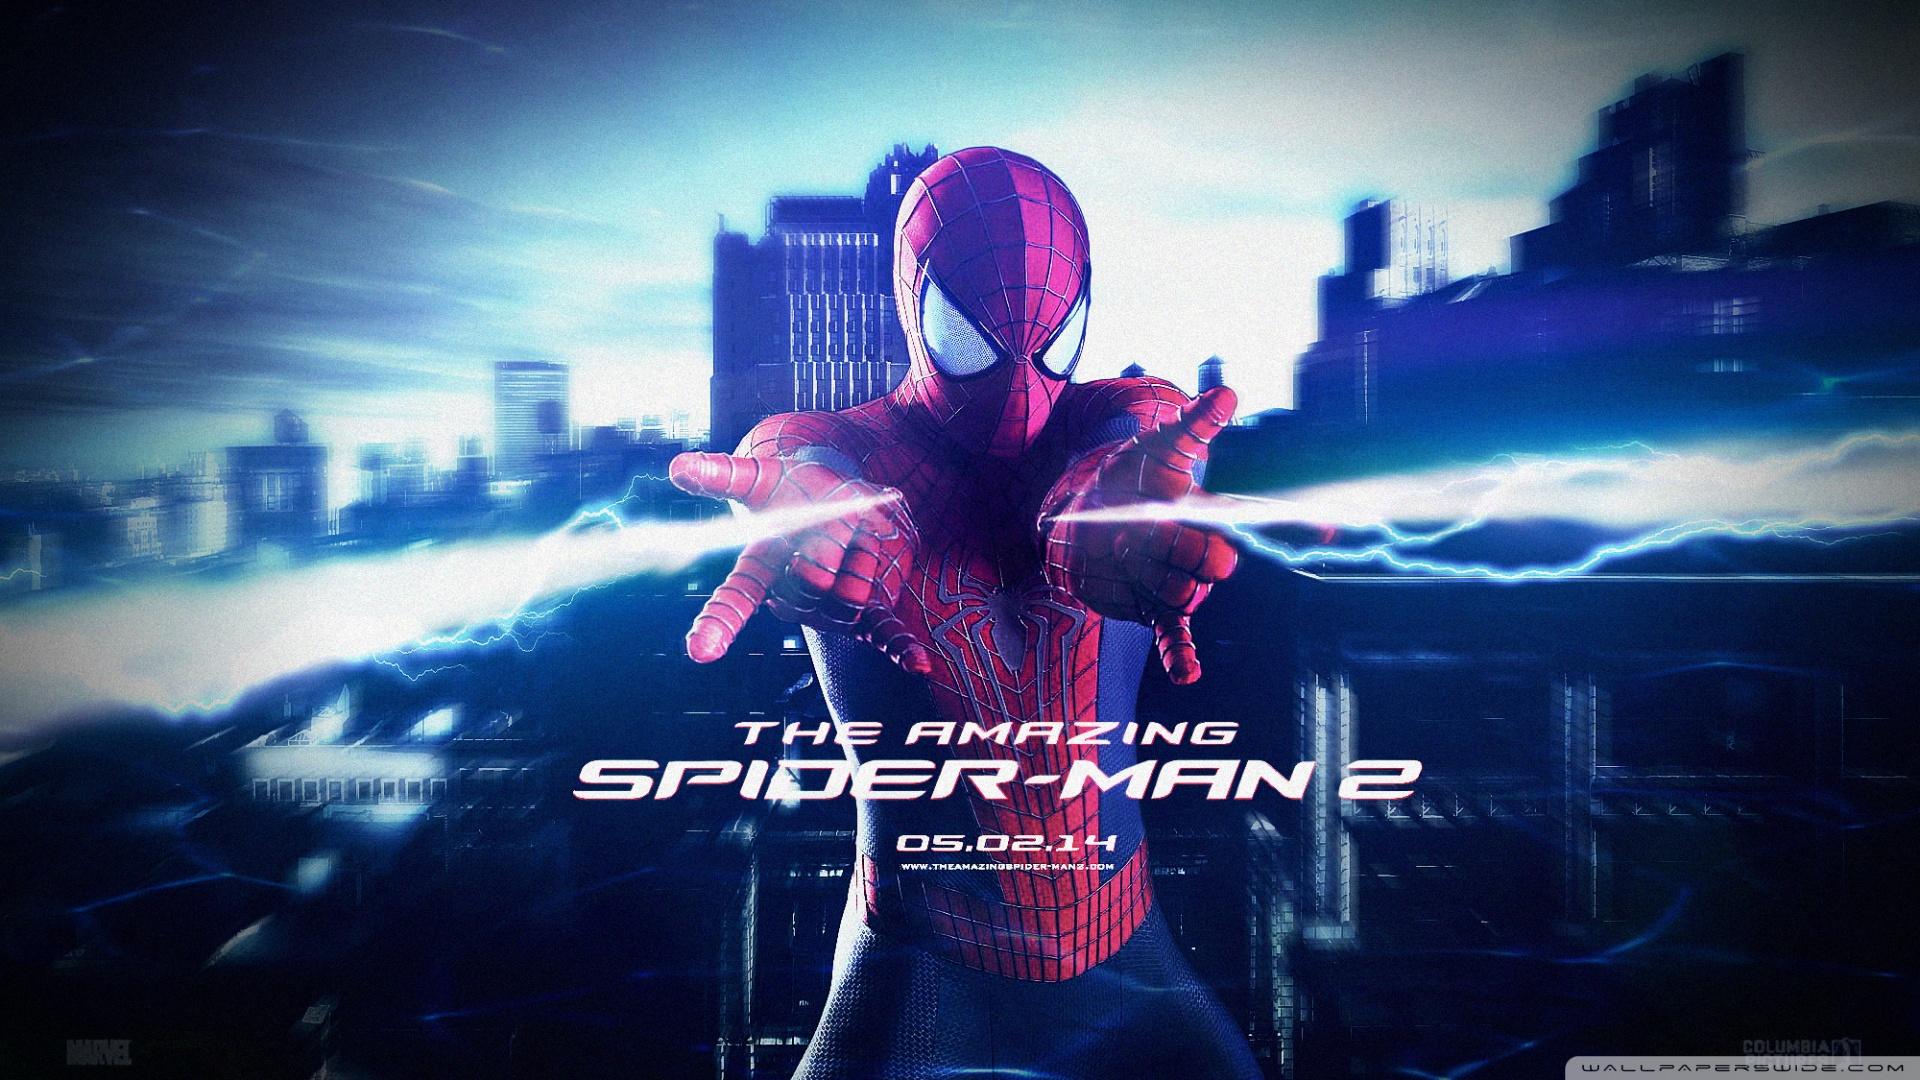 Amazing Spider-man 2 Hd Movie Wallpaper - Amazing Spider Man 2 Poster Hd - HD Wallpaper